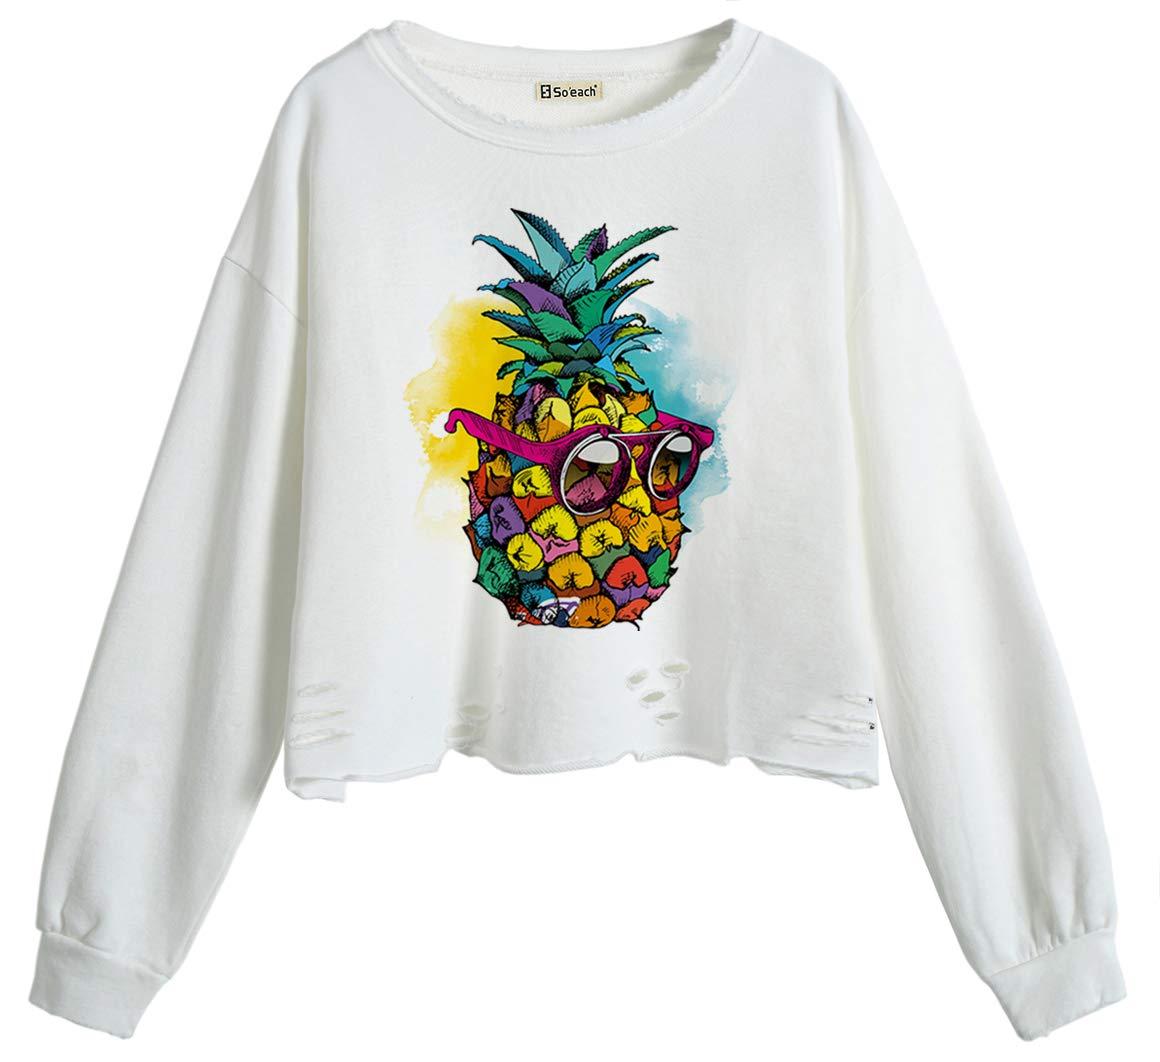 So'each Women Jumper Sweatshirt Sunglasses Pineapple Crop Top White